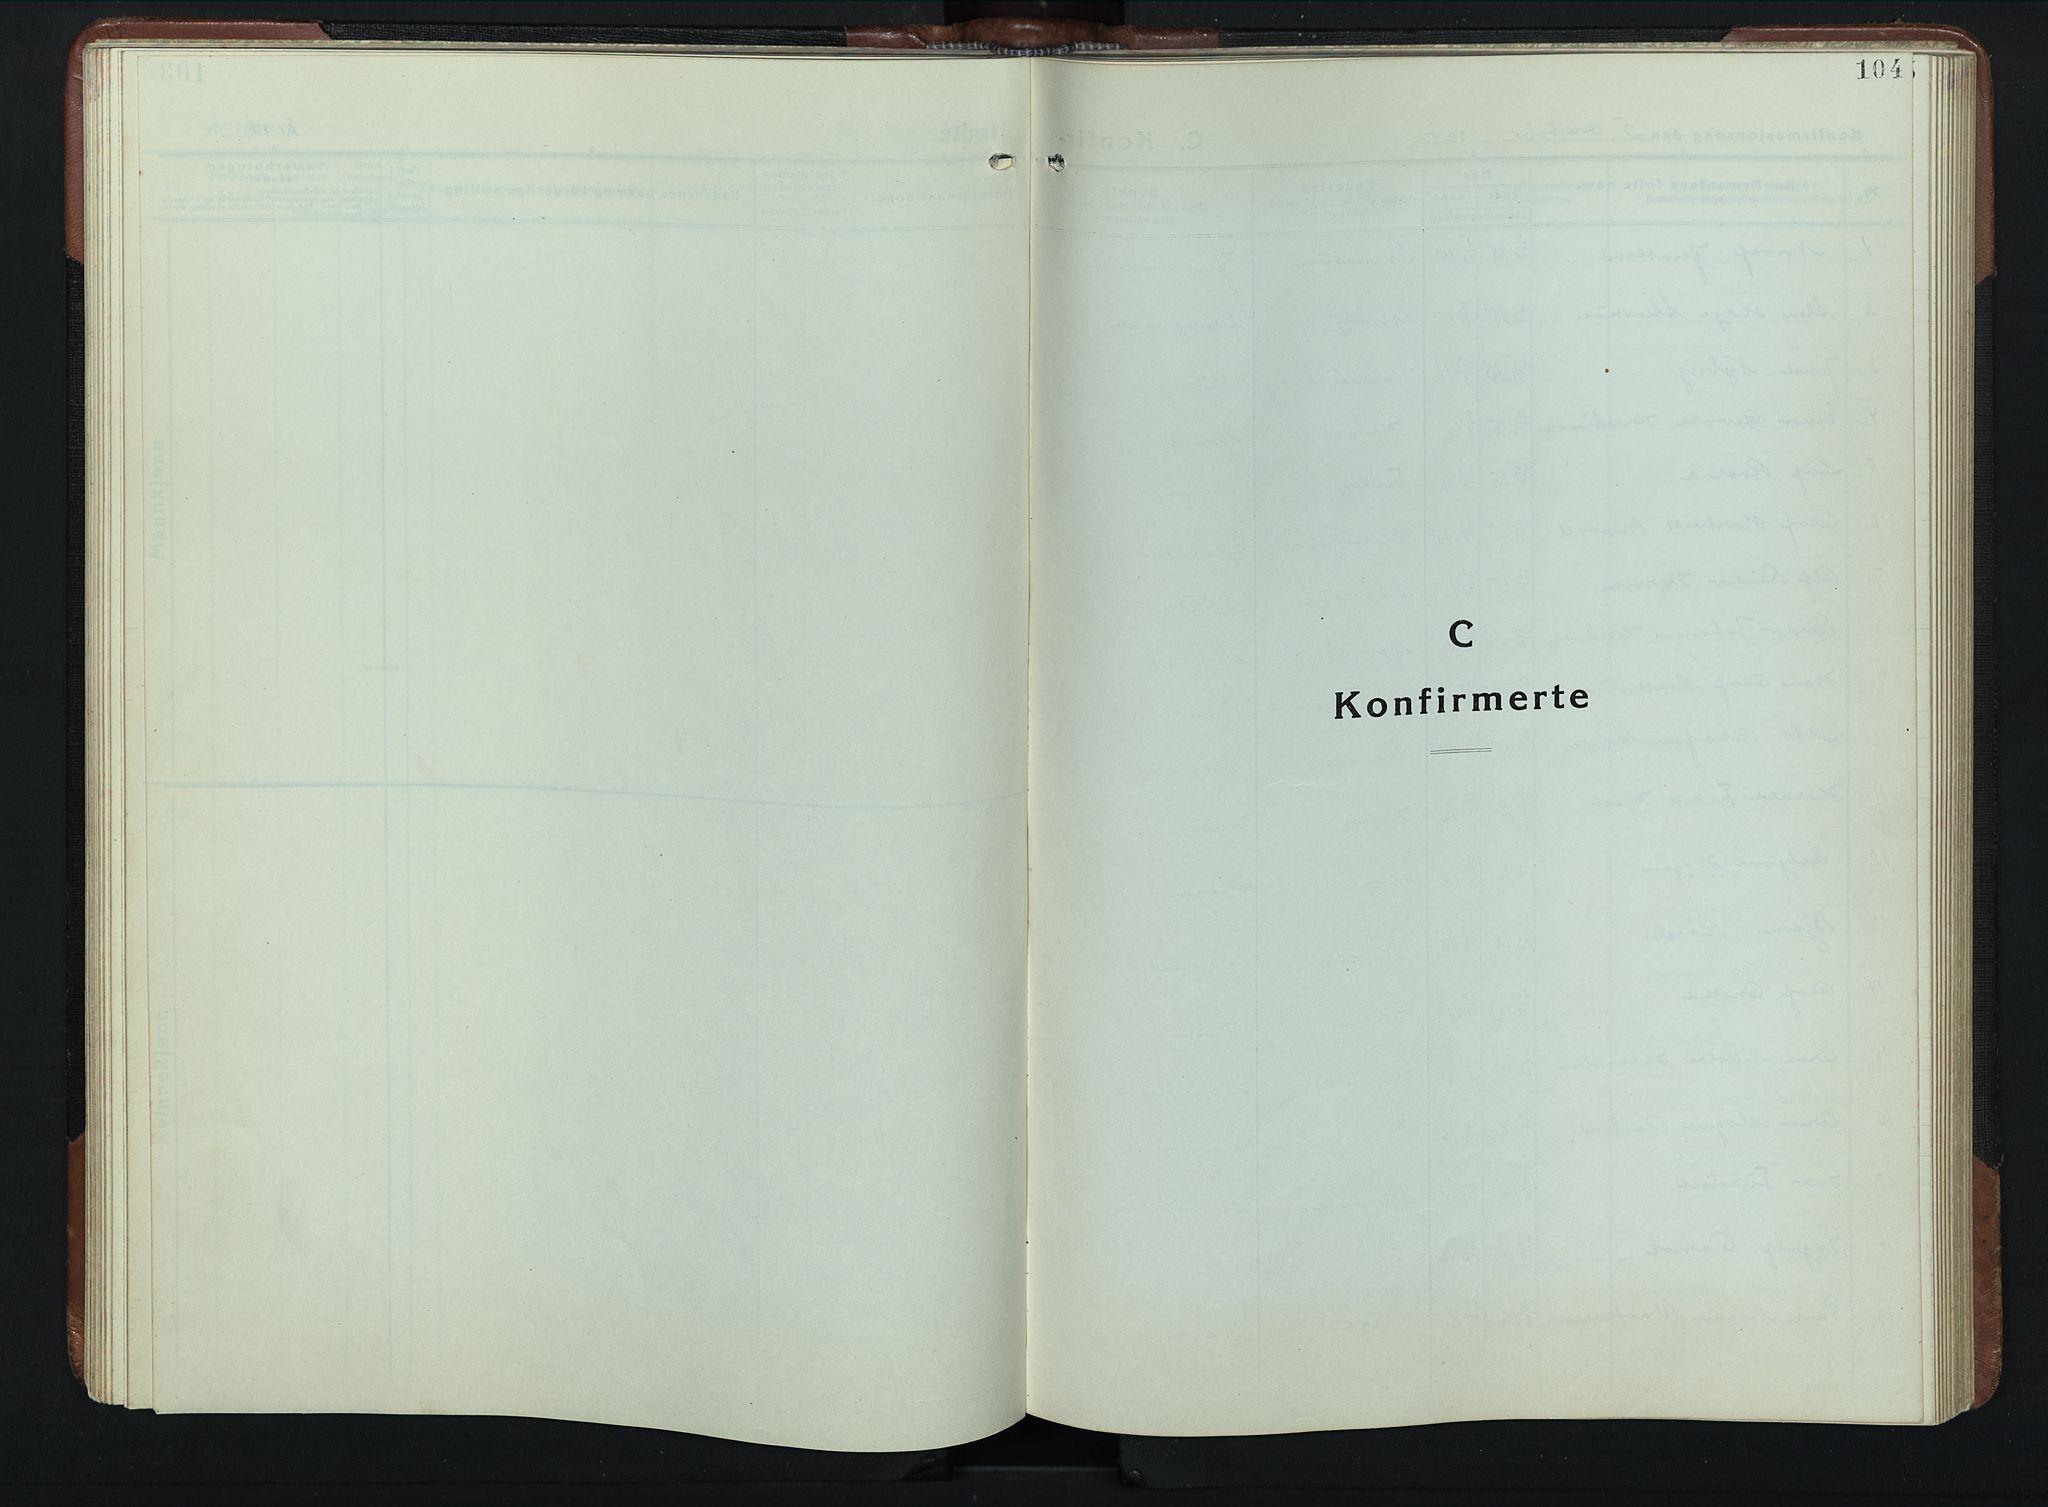 SAH, Vardal prestekontor, H/Ha/Hab/L0023: Klokkerbok nr. 23, 1929-1941, s. 104